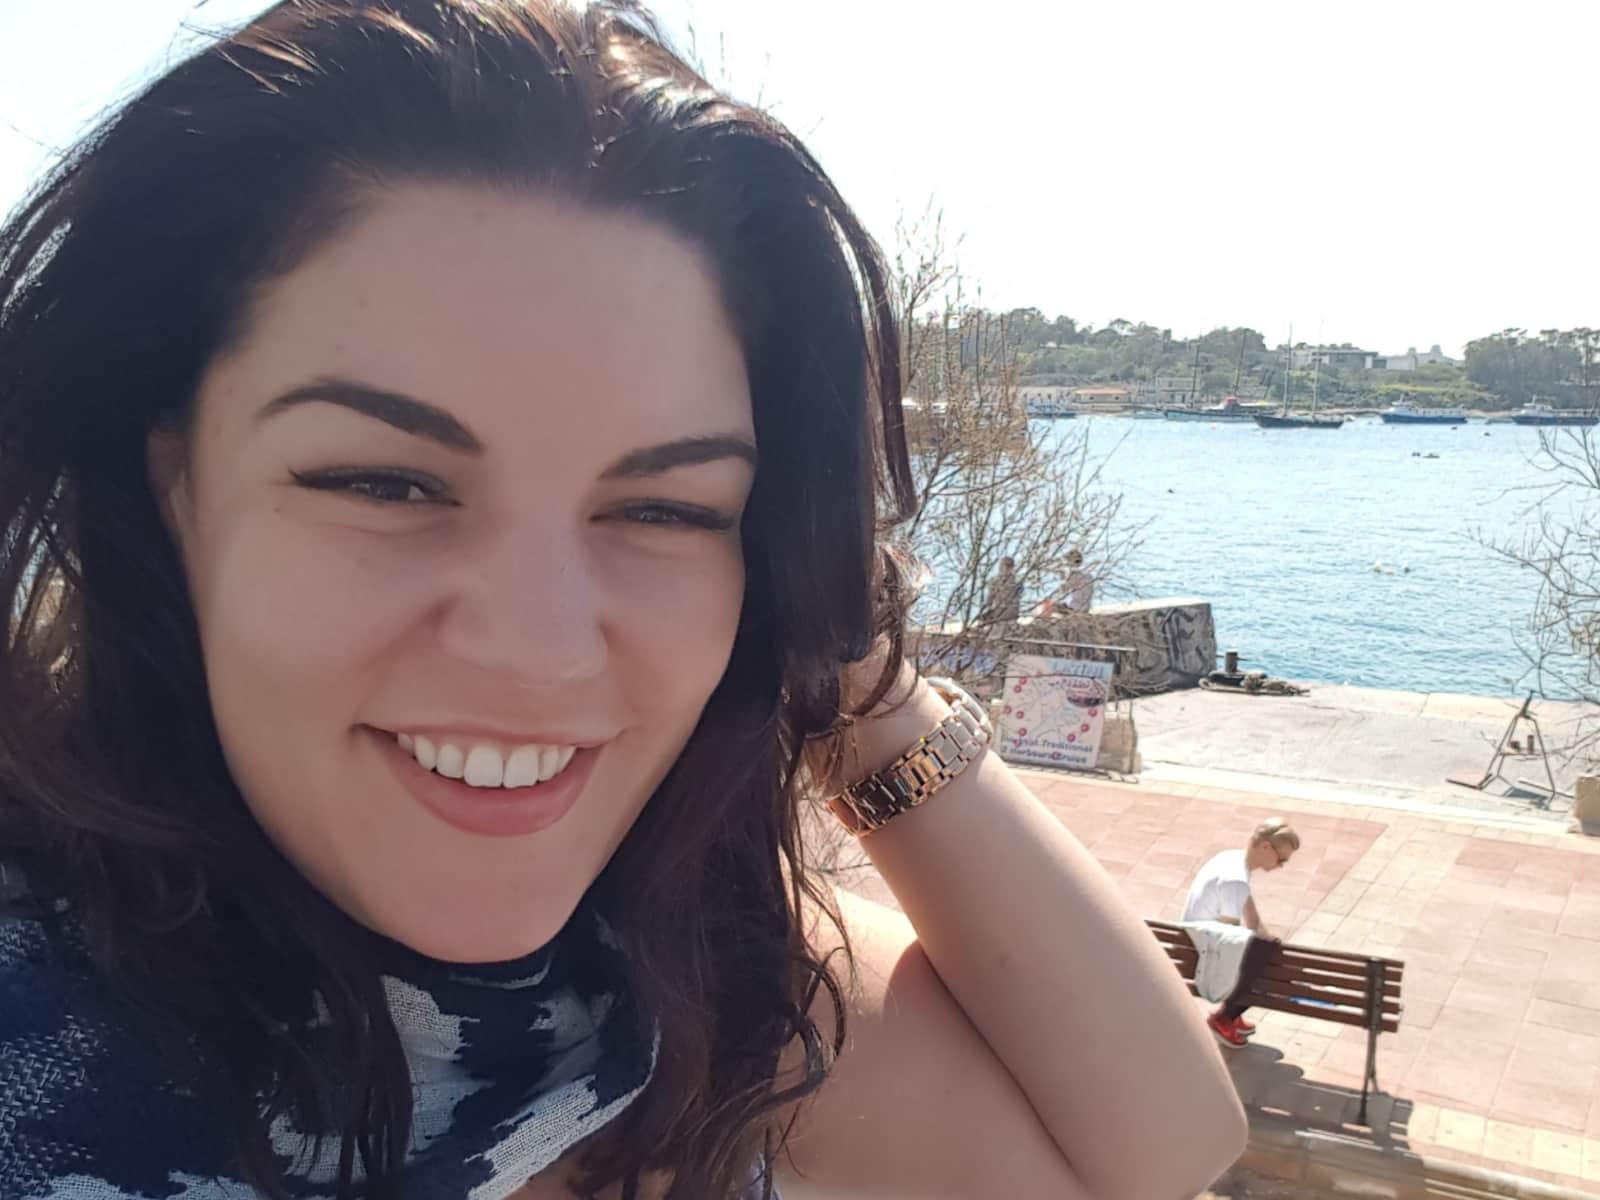 Sarah from Sydney, New South Wales, Australia